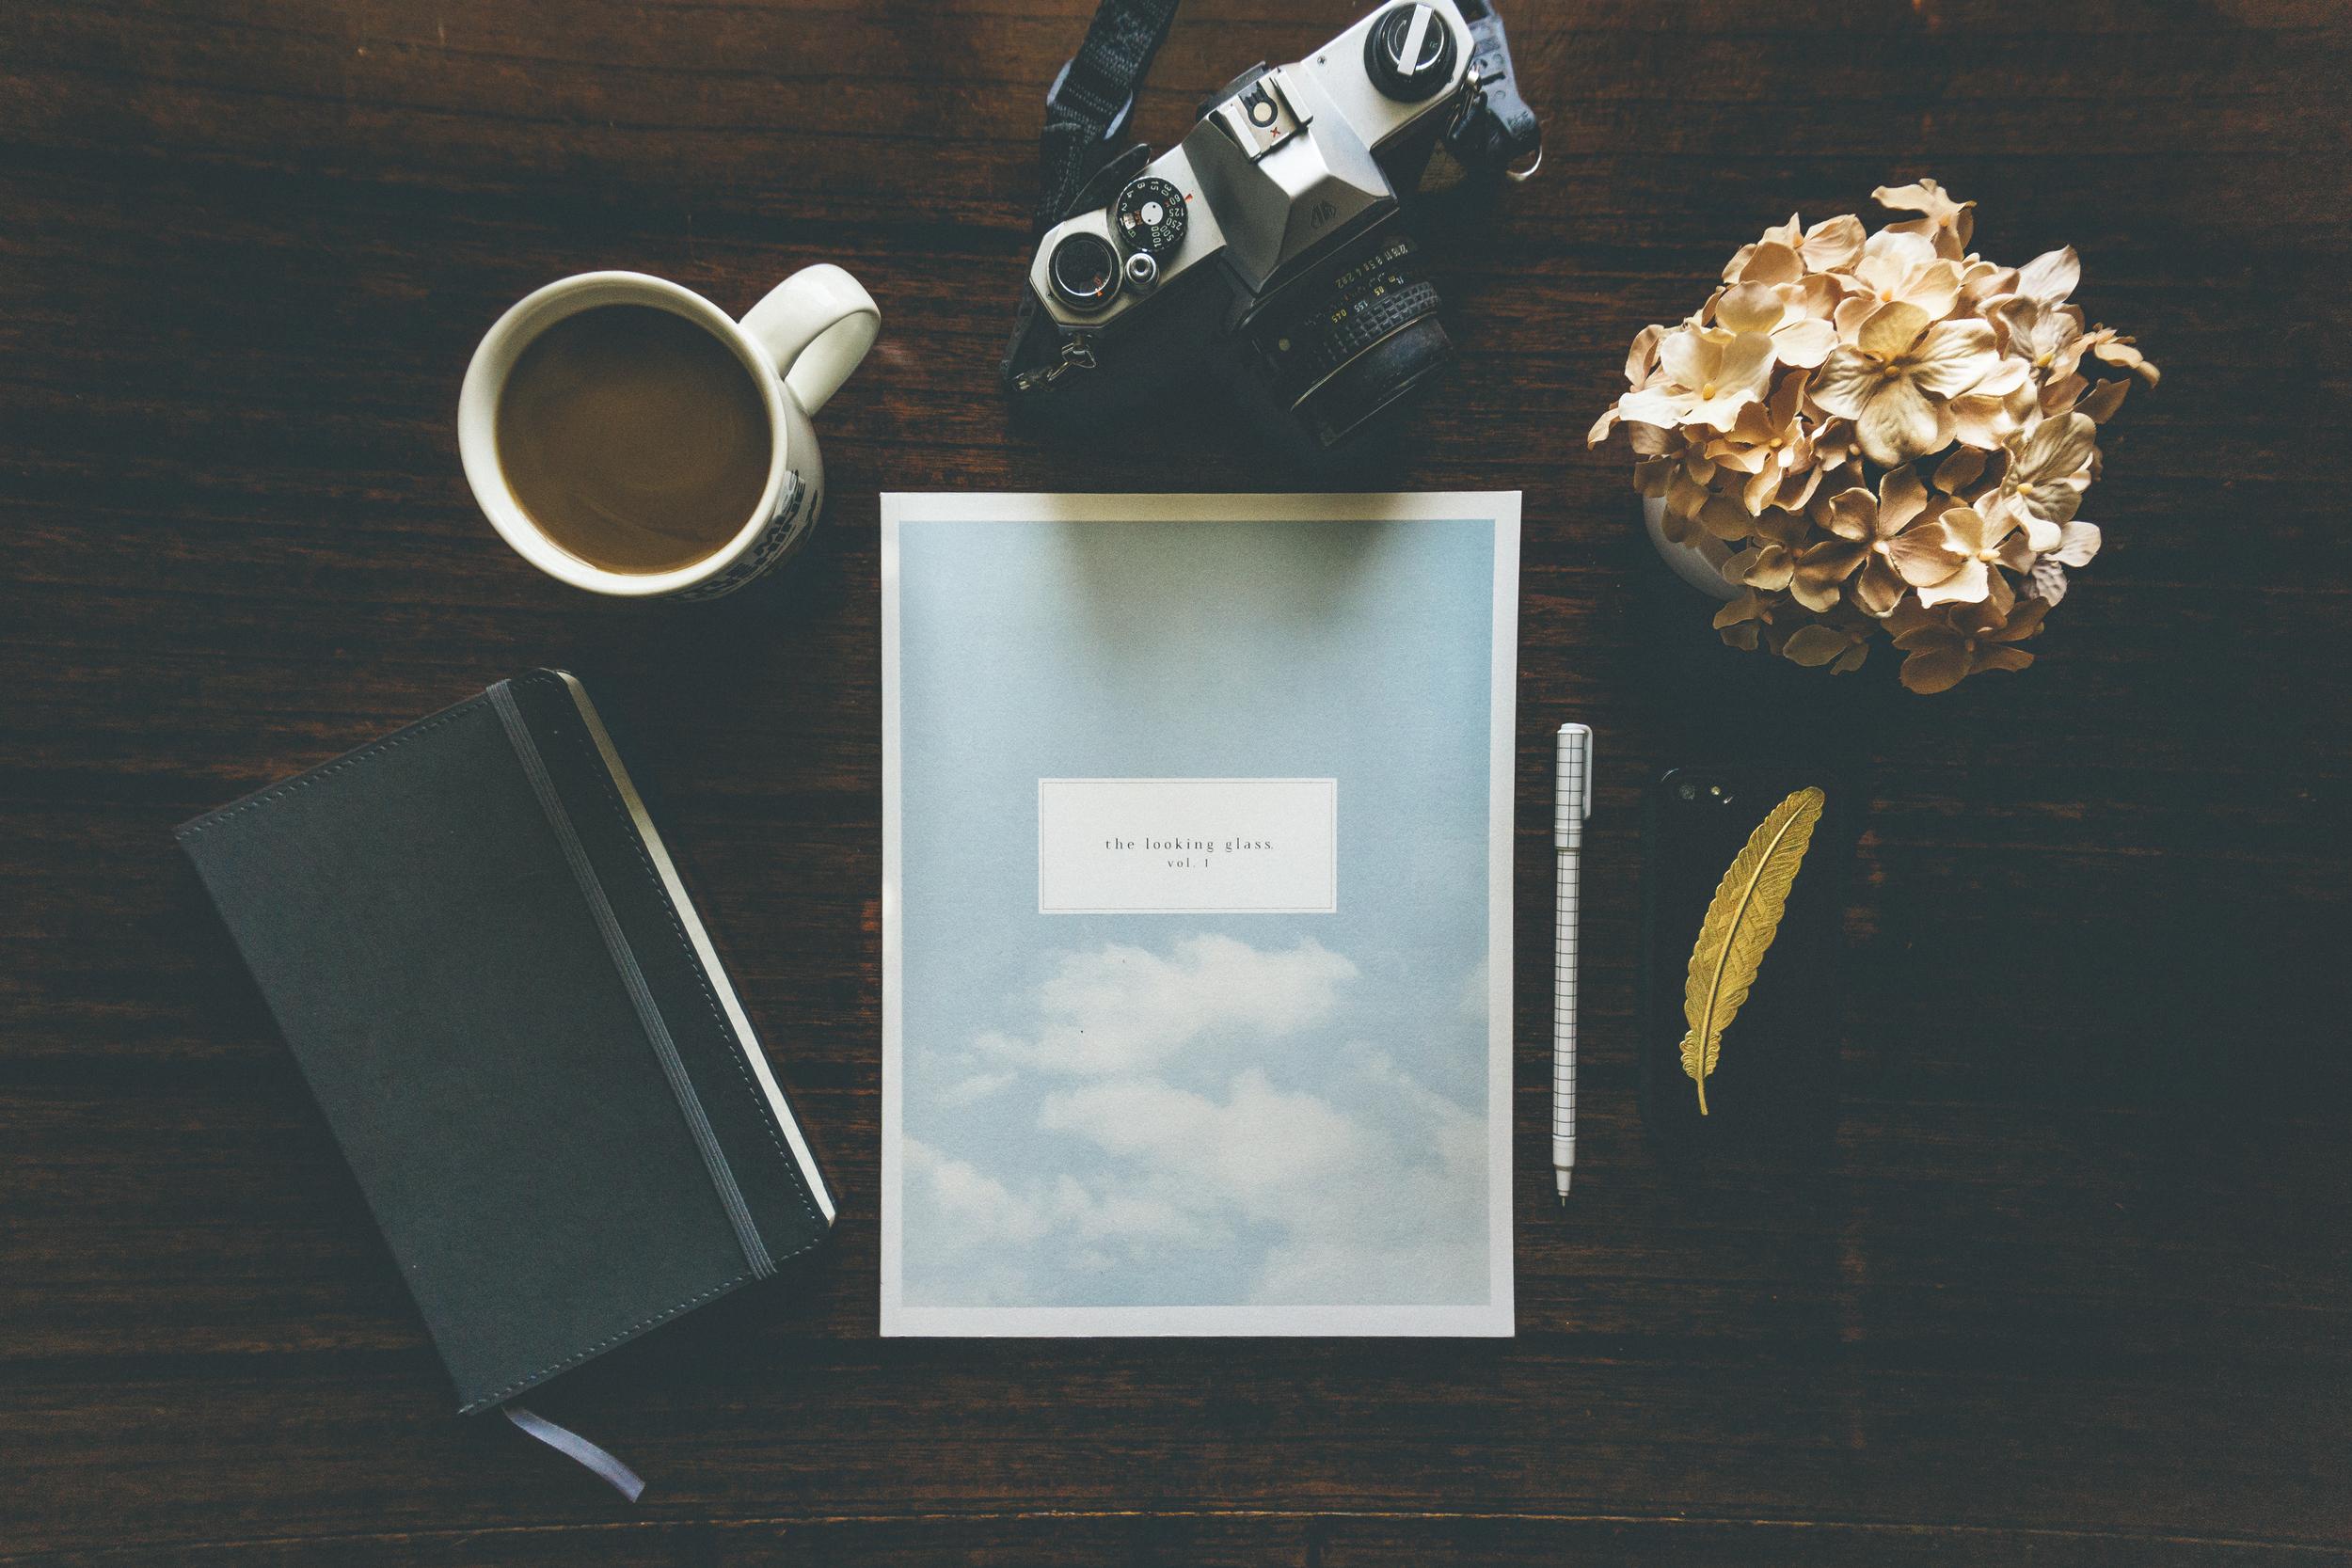 bookproduct-1.jpg